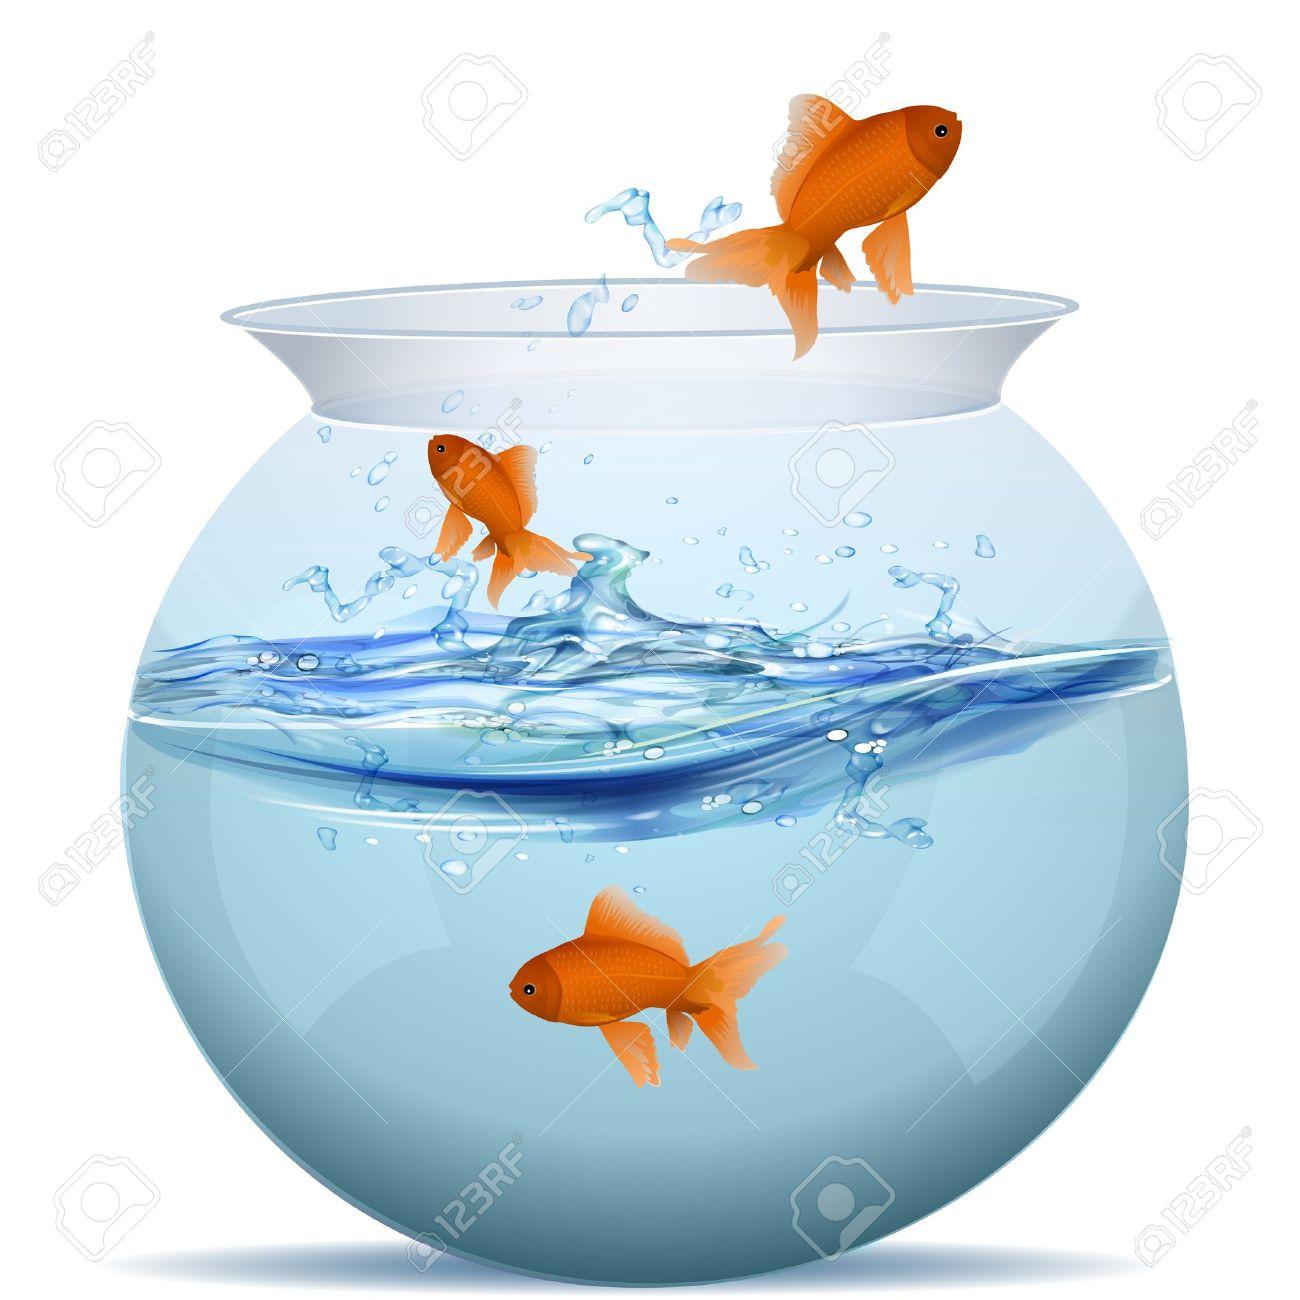 illustration of fish tank on white background Stock Vector - 8248274